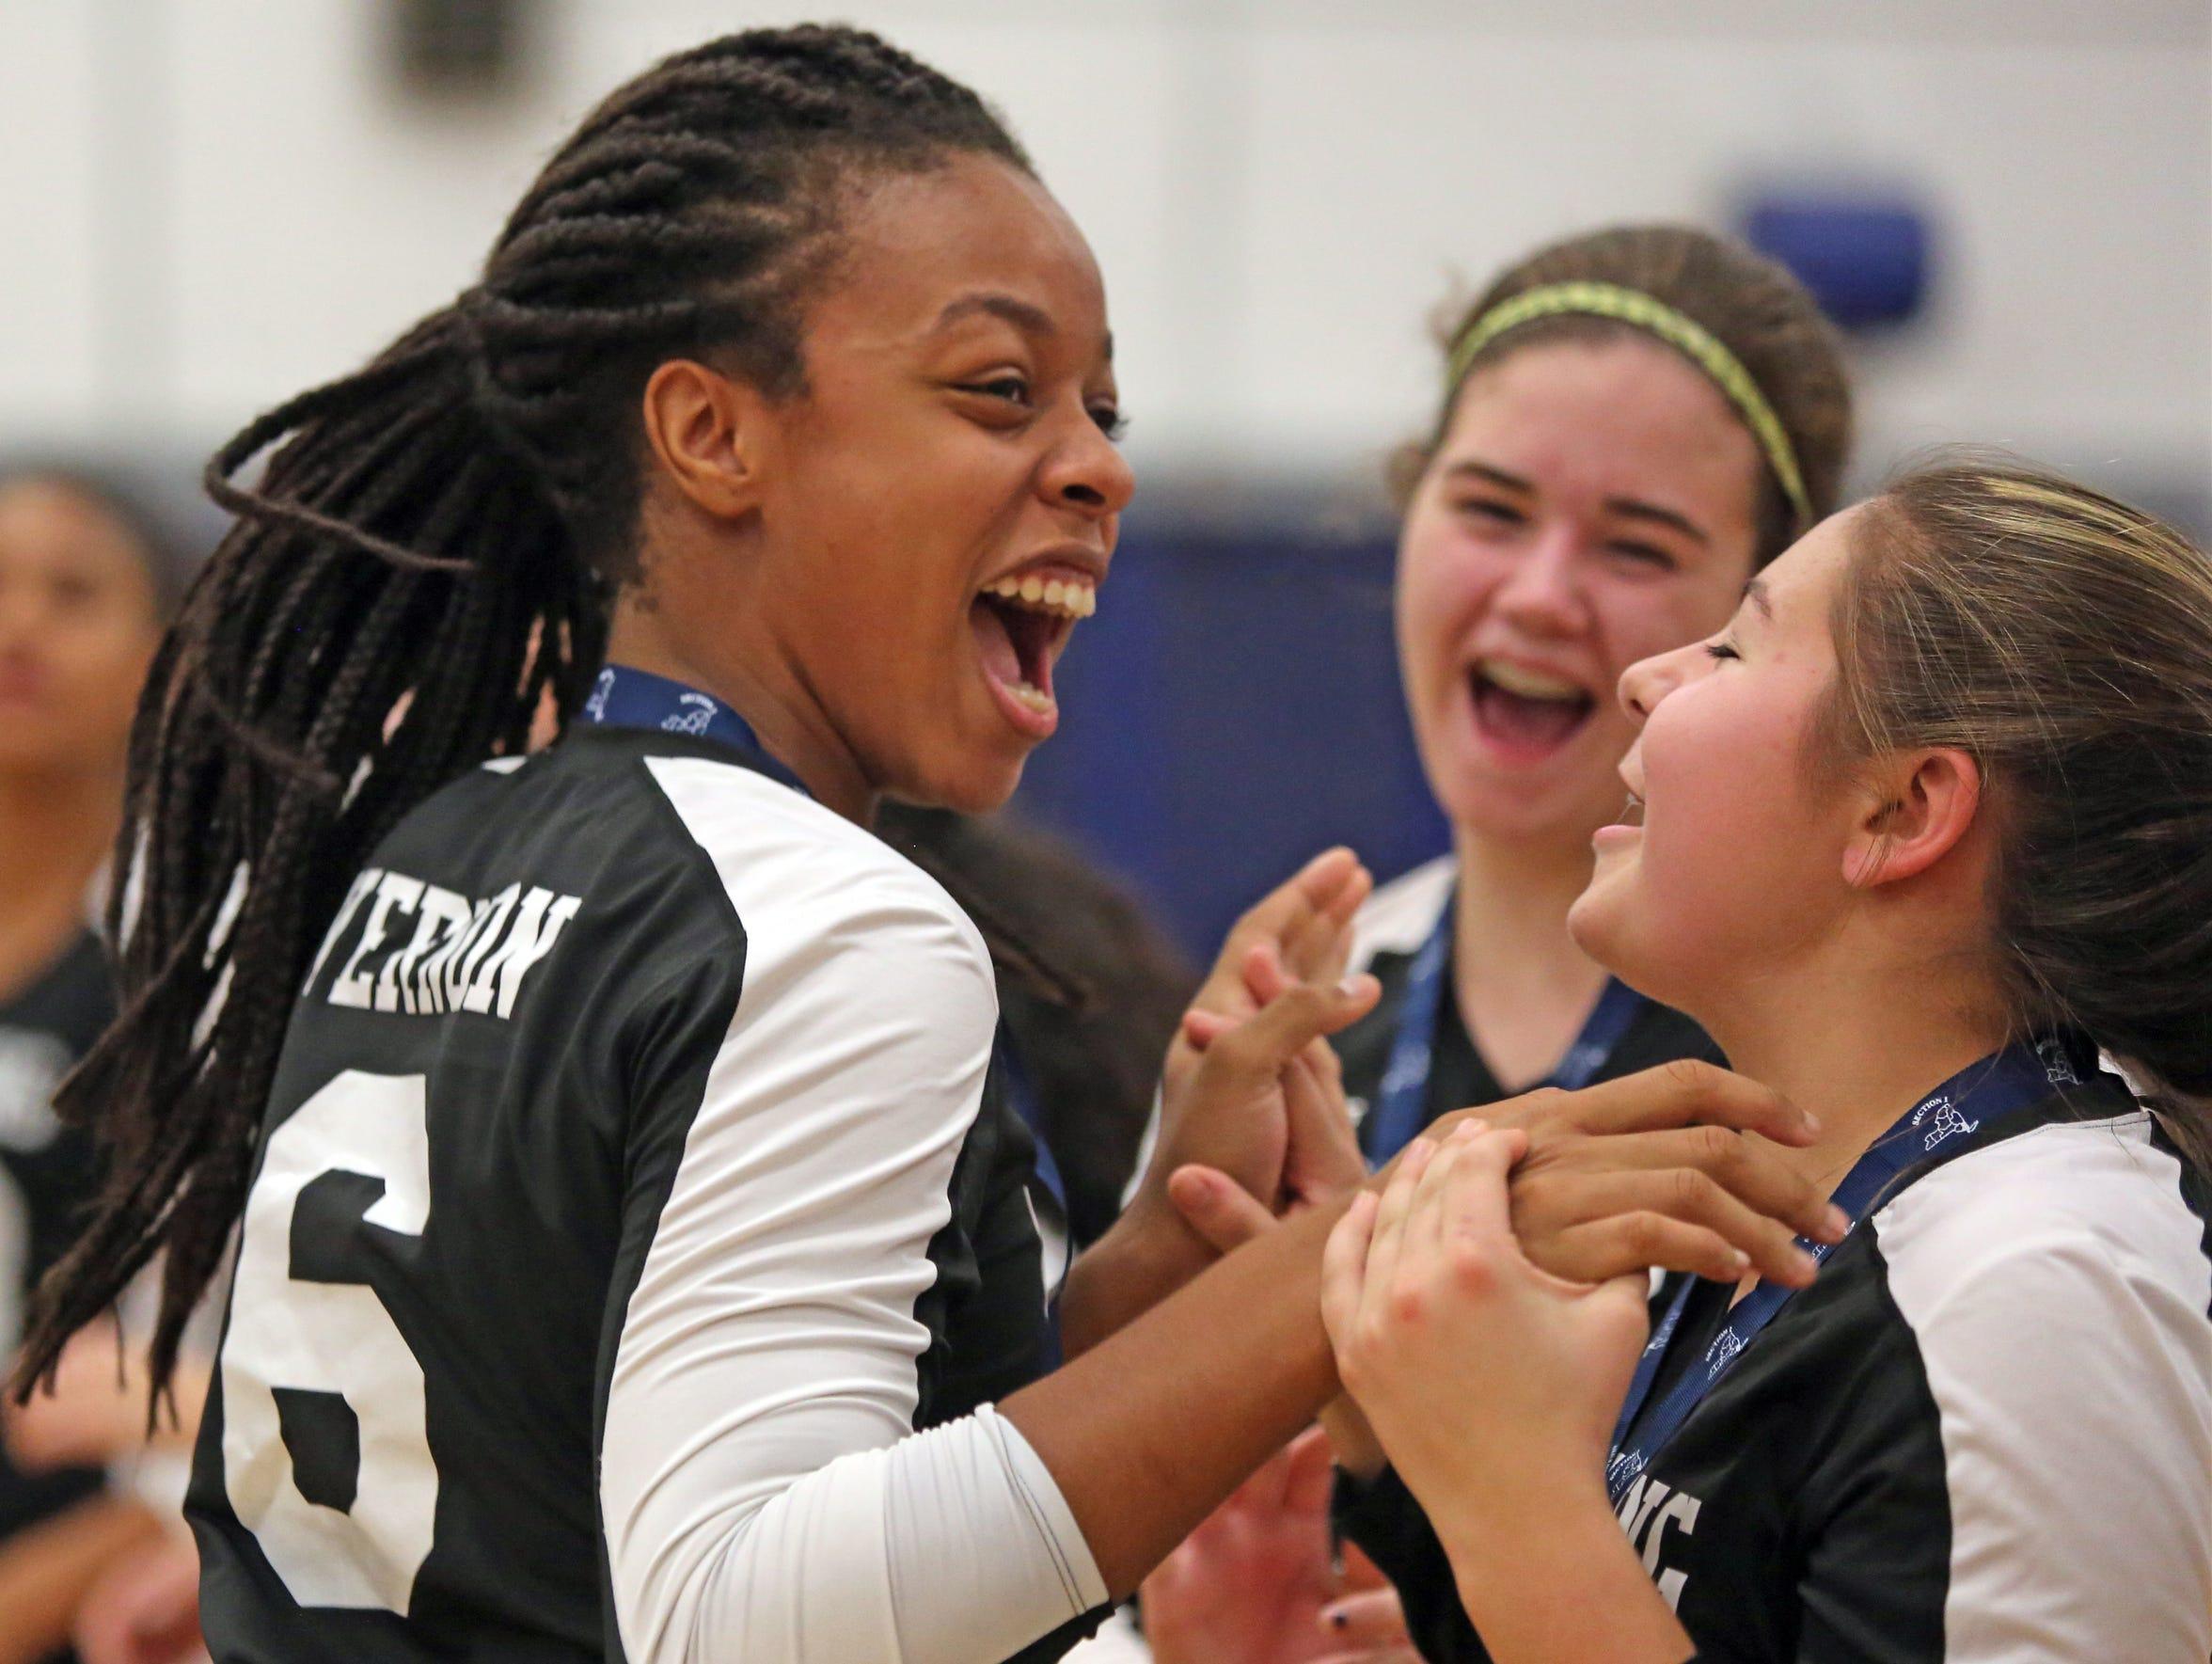 Ossining's Mychael Vernon (6) celebrates with her team